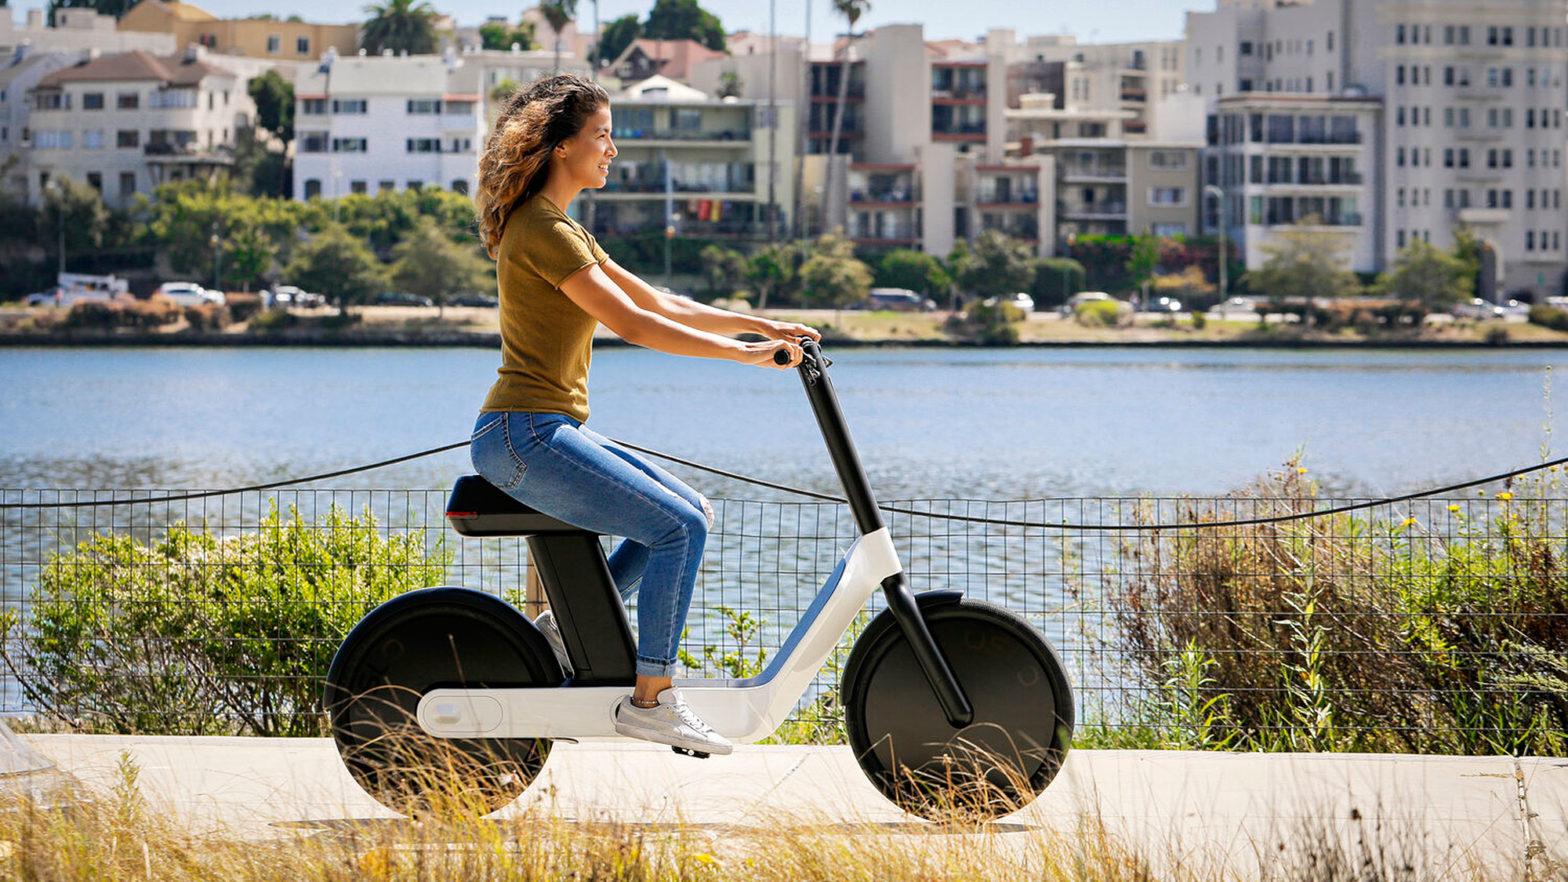 Karmic OSLO Electric Bicycle